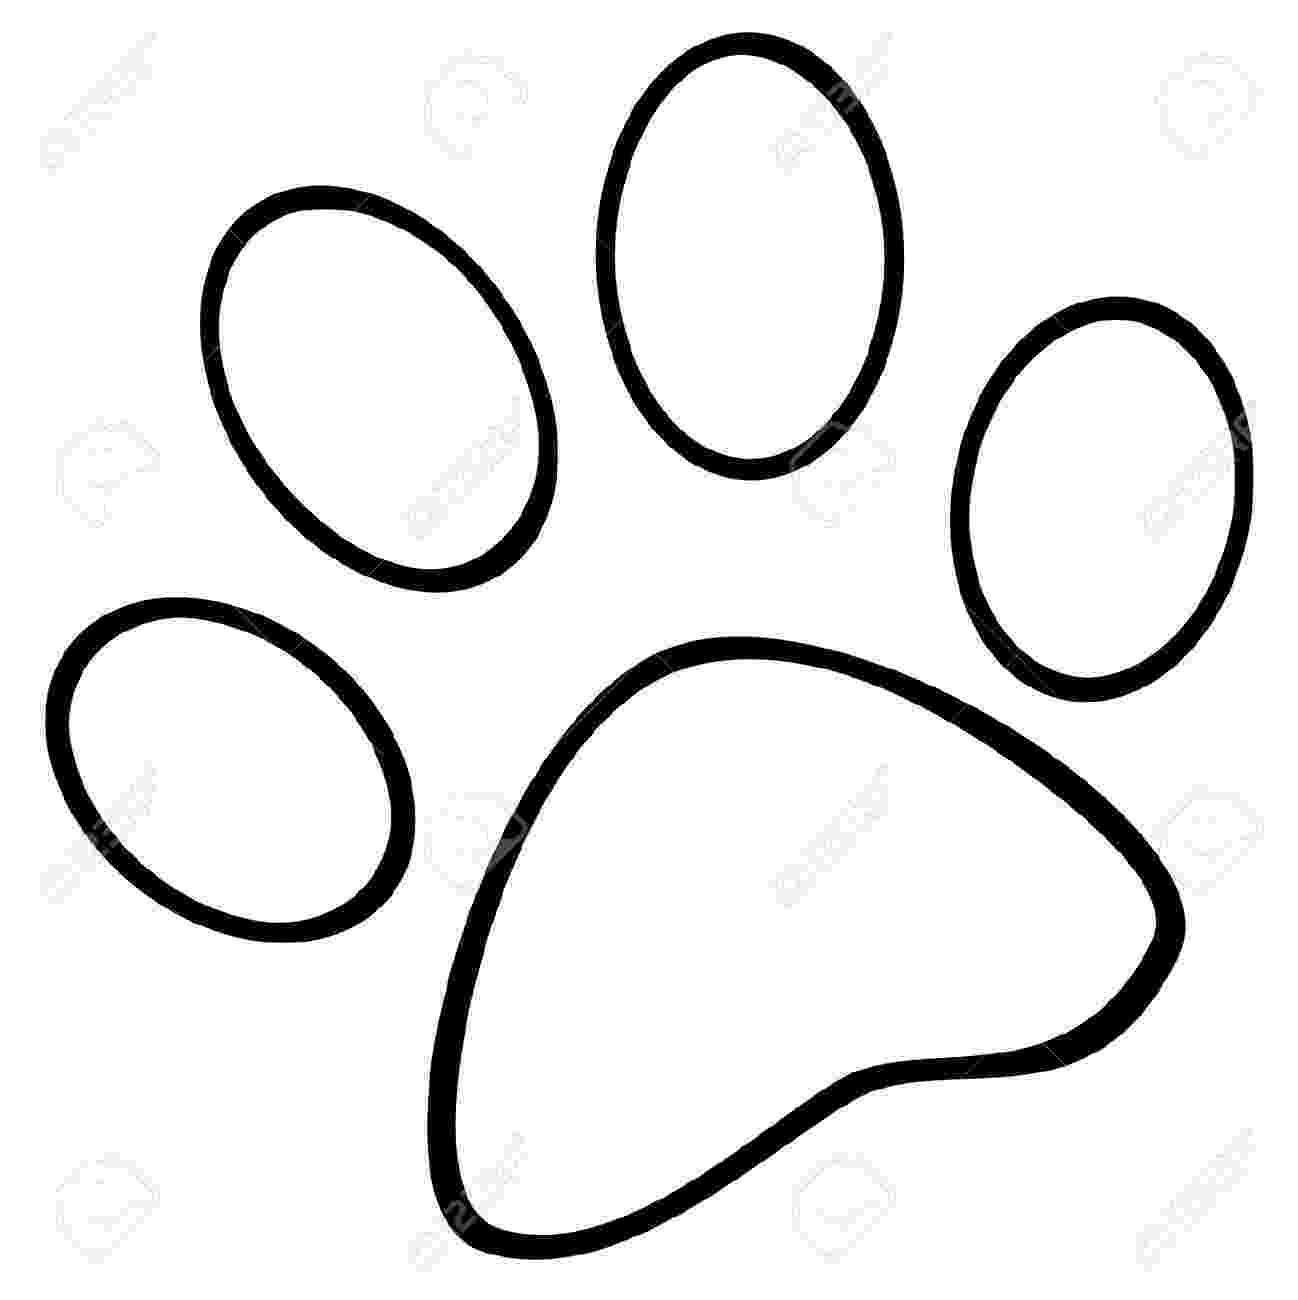 dog paw coloring page dog paw coloring page at getcoloringscom free printable page coloring paw dog 1 1